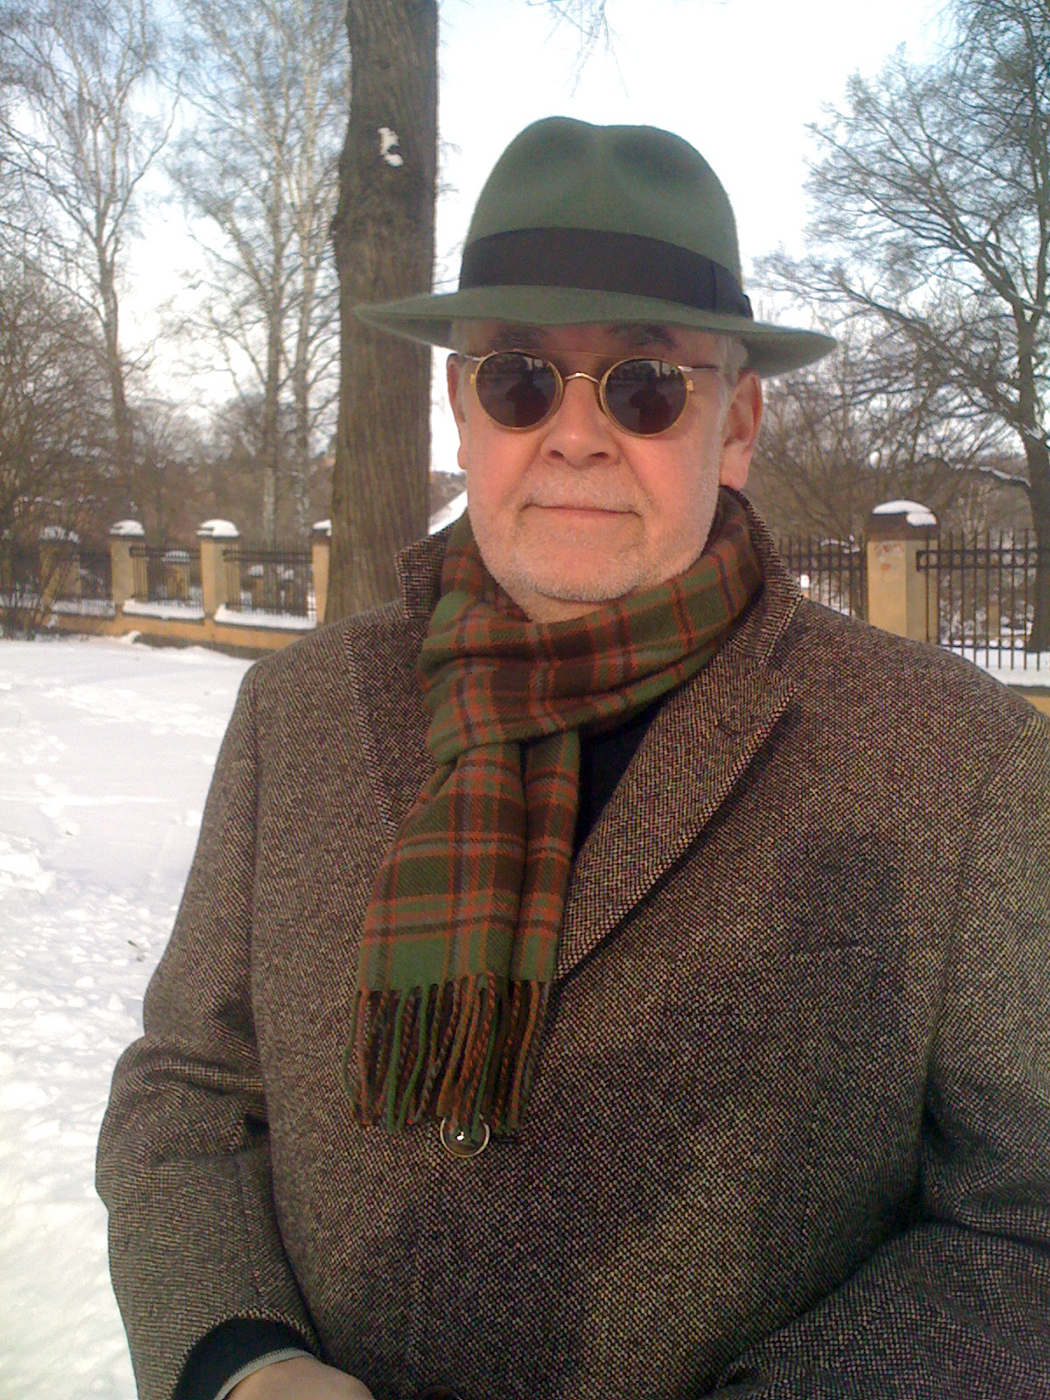 Interview_with_Ingemar_Albertsson_at_Keikari_dot_com10